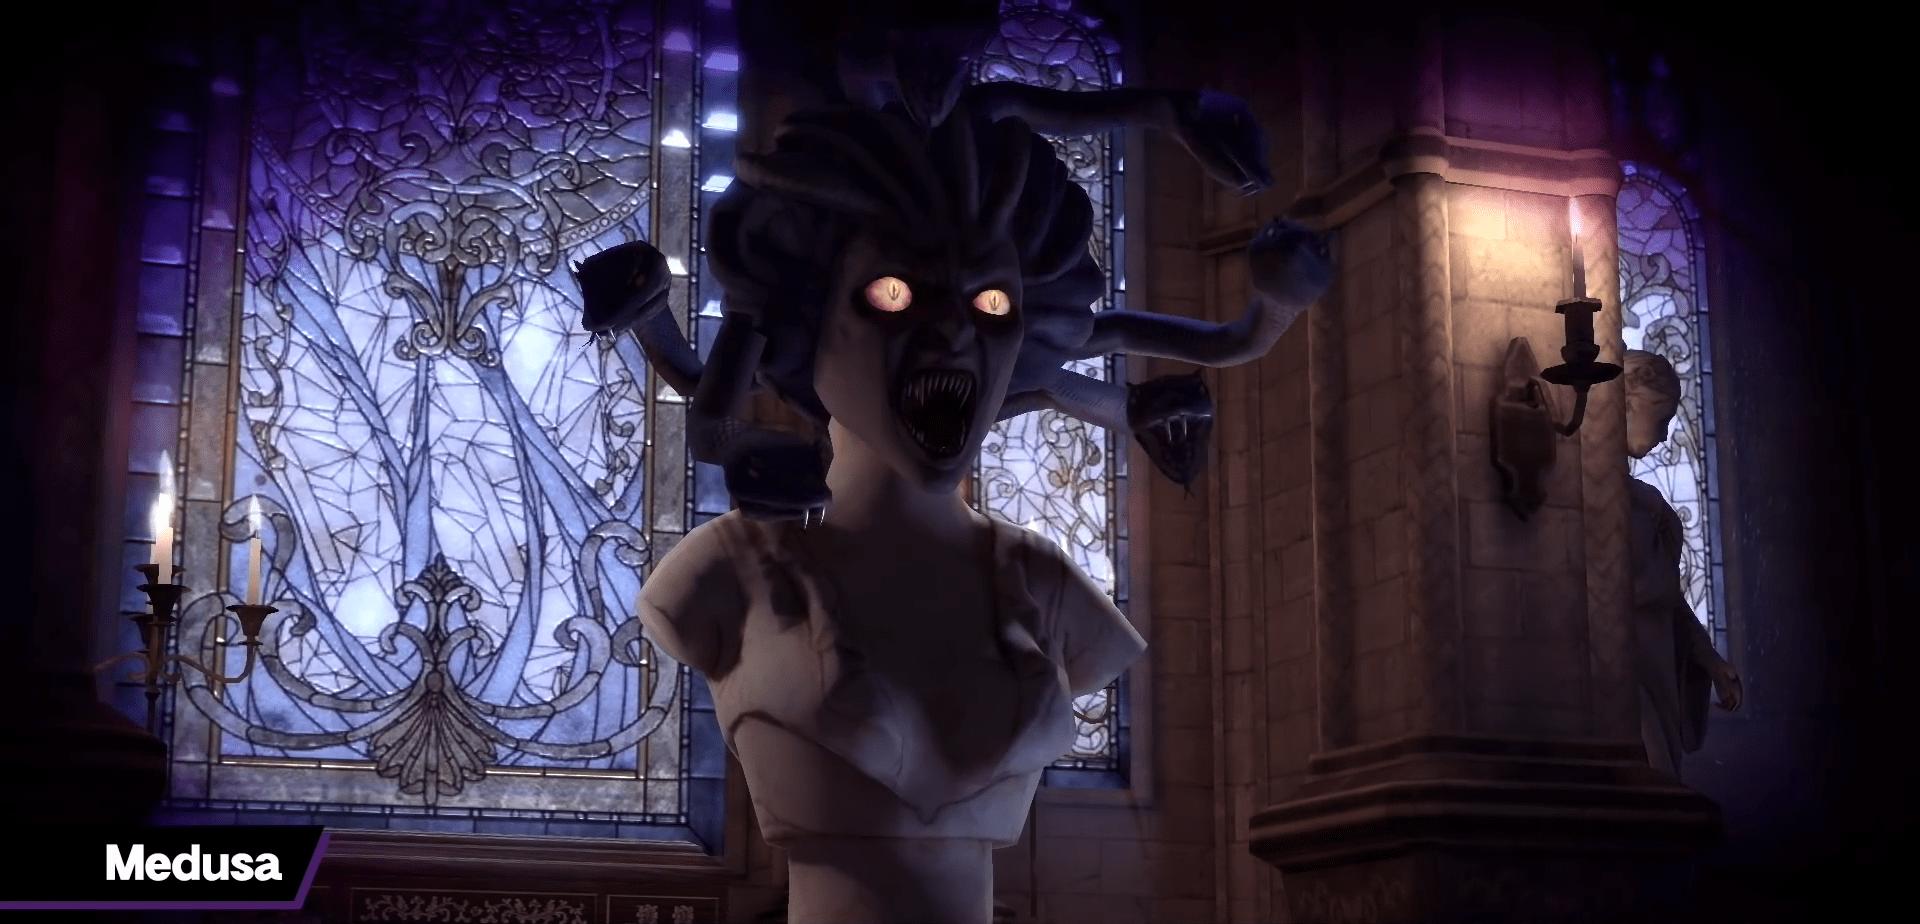 Super Smash Bros ultimate nintendo direct imagen 4